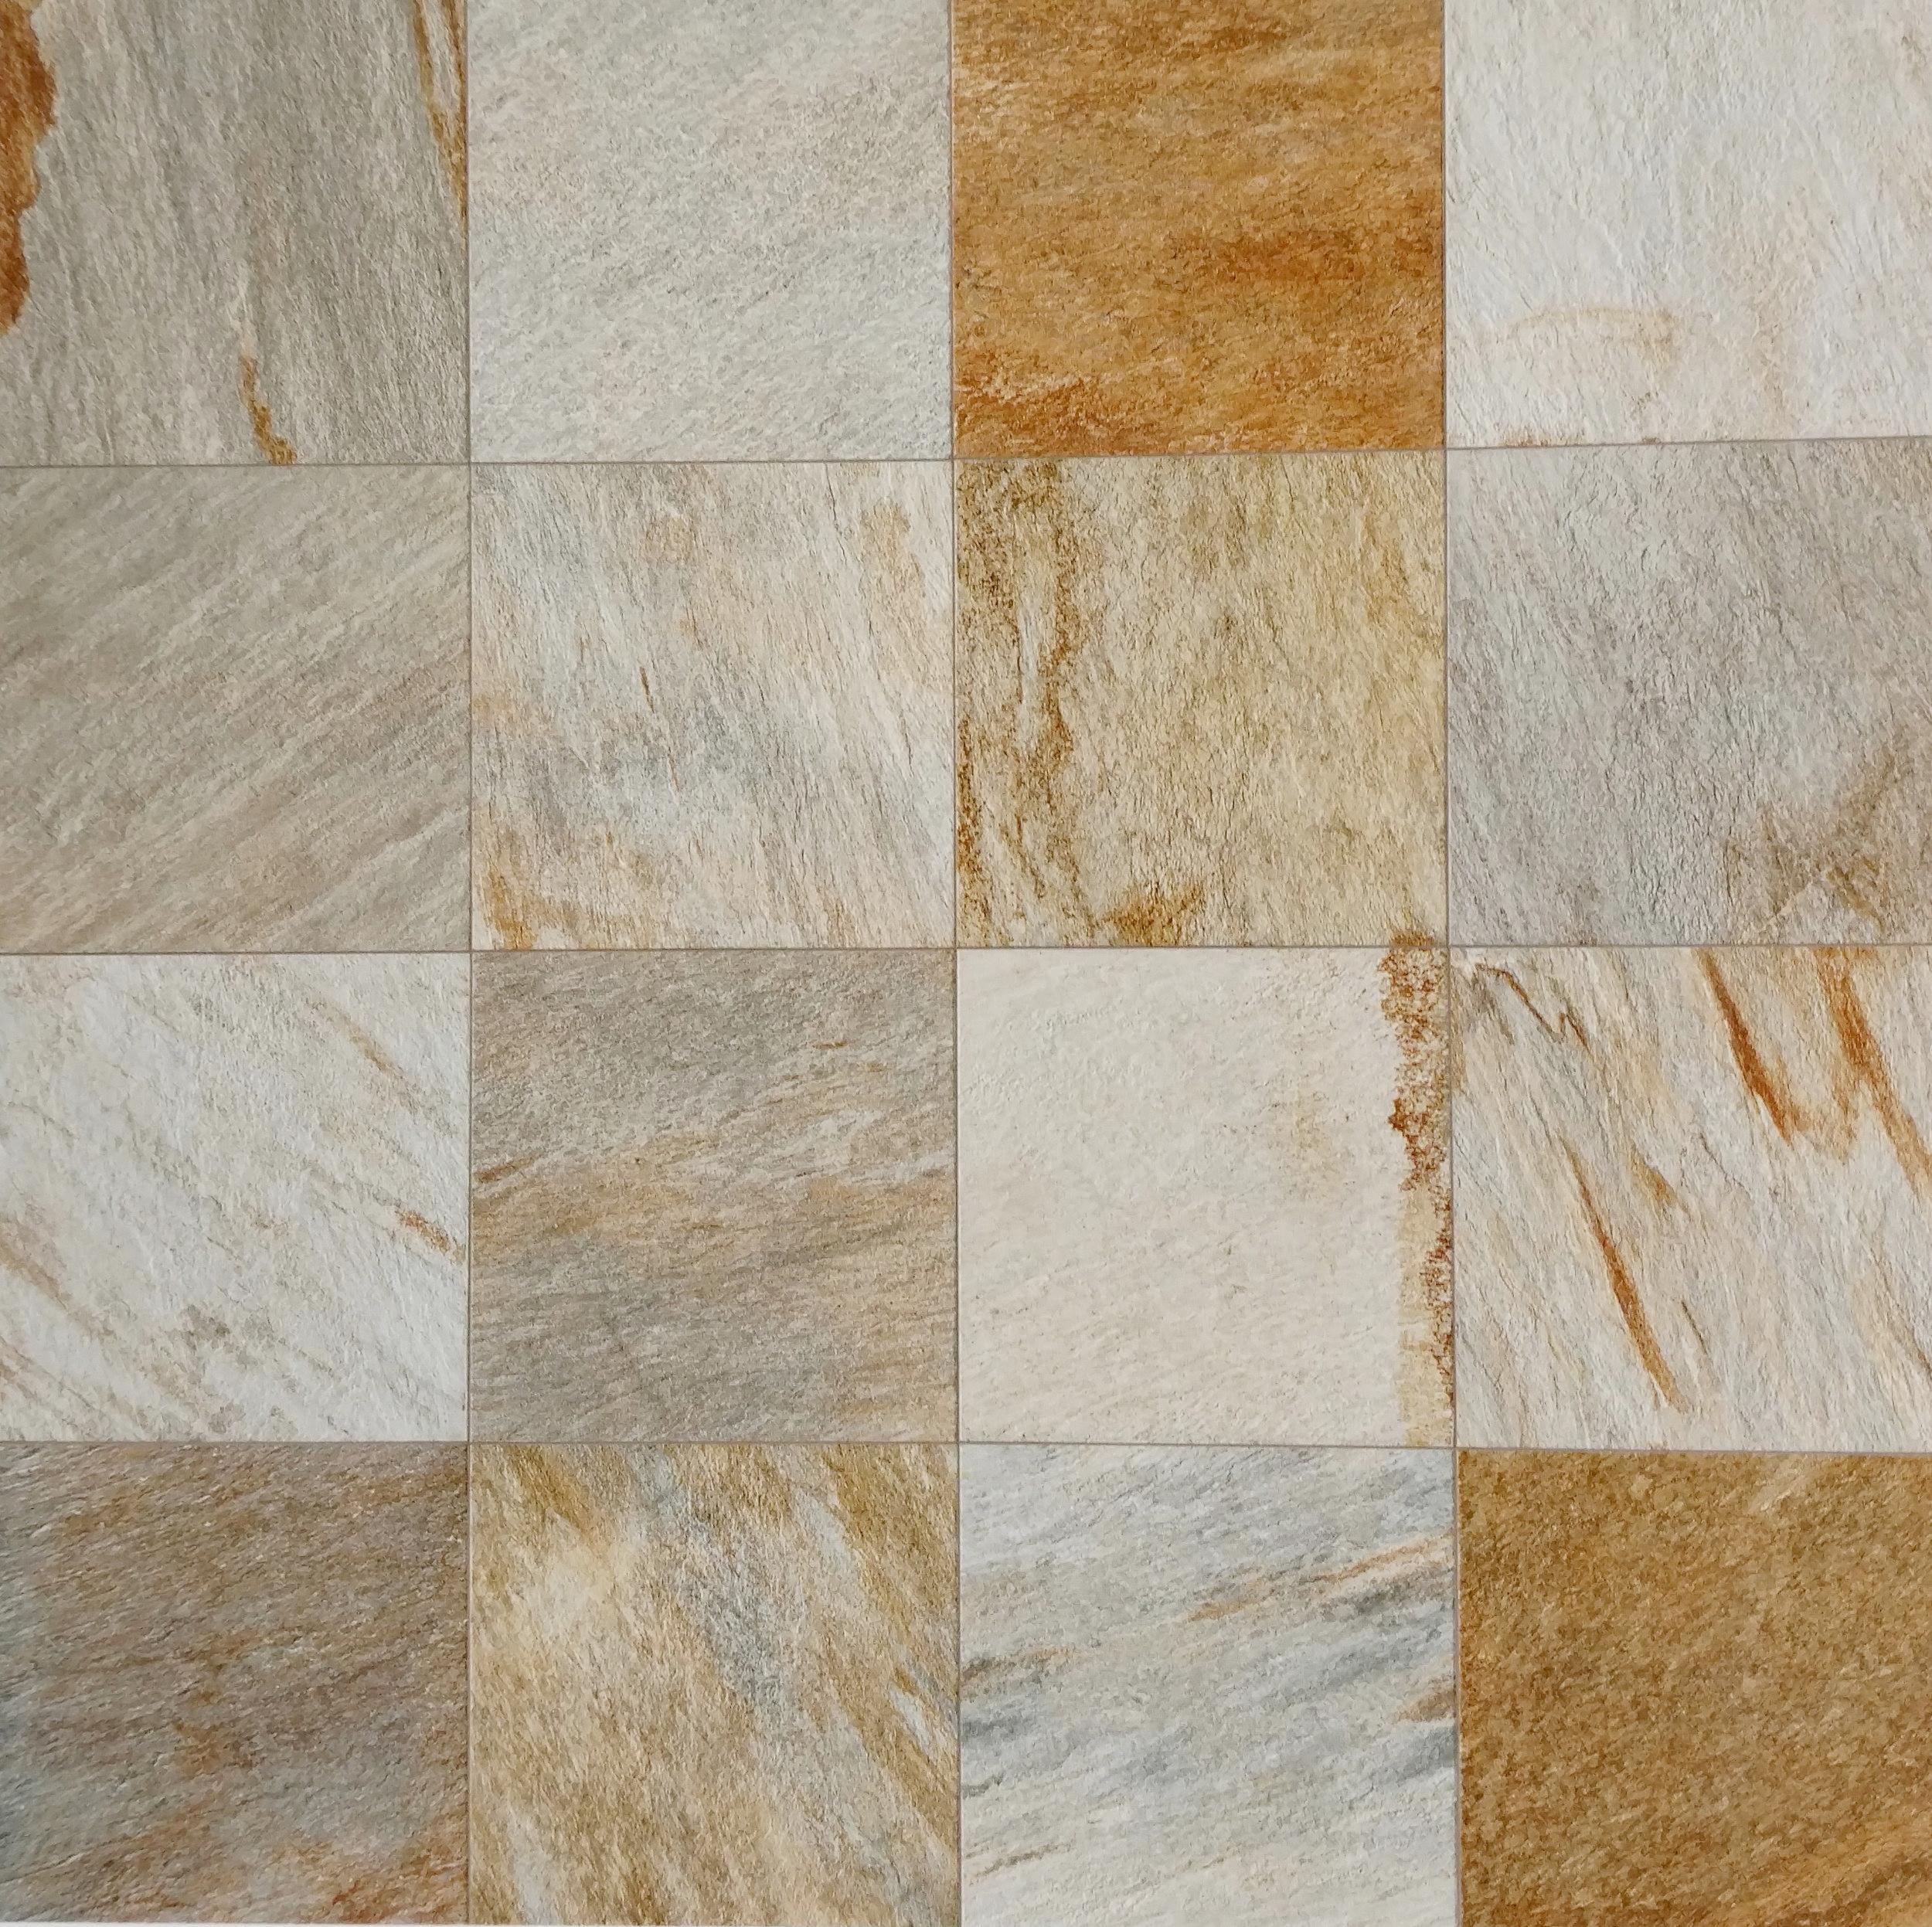 "QuartziteMulticolor 12"" x 12"" Porcelain (16 pieces shown for variation) Also available in : 6"" x 6"", 12"" x 24"", 18""x 18"""